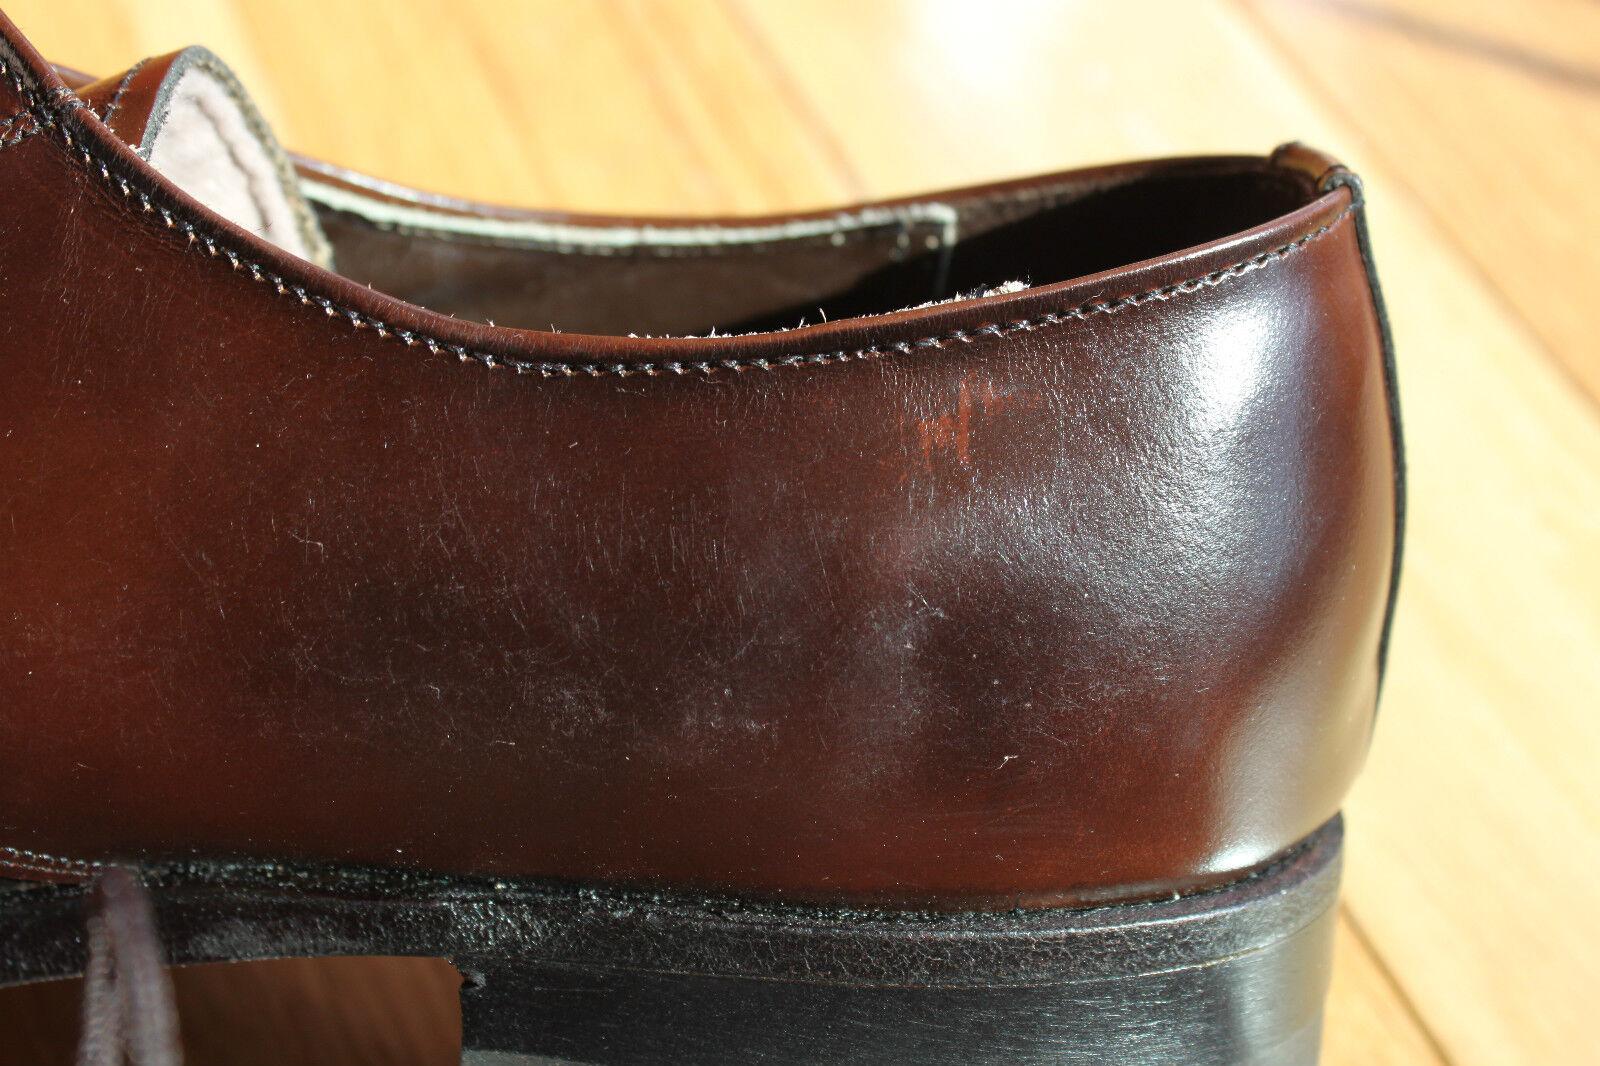 Eaton's Brown Leather Shoes Brown Eaton's NOS Eaton Sanitized Loafers Sz 11 Biltrite Deadstock ab6b64